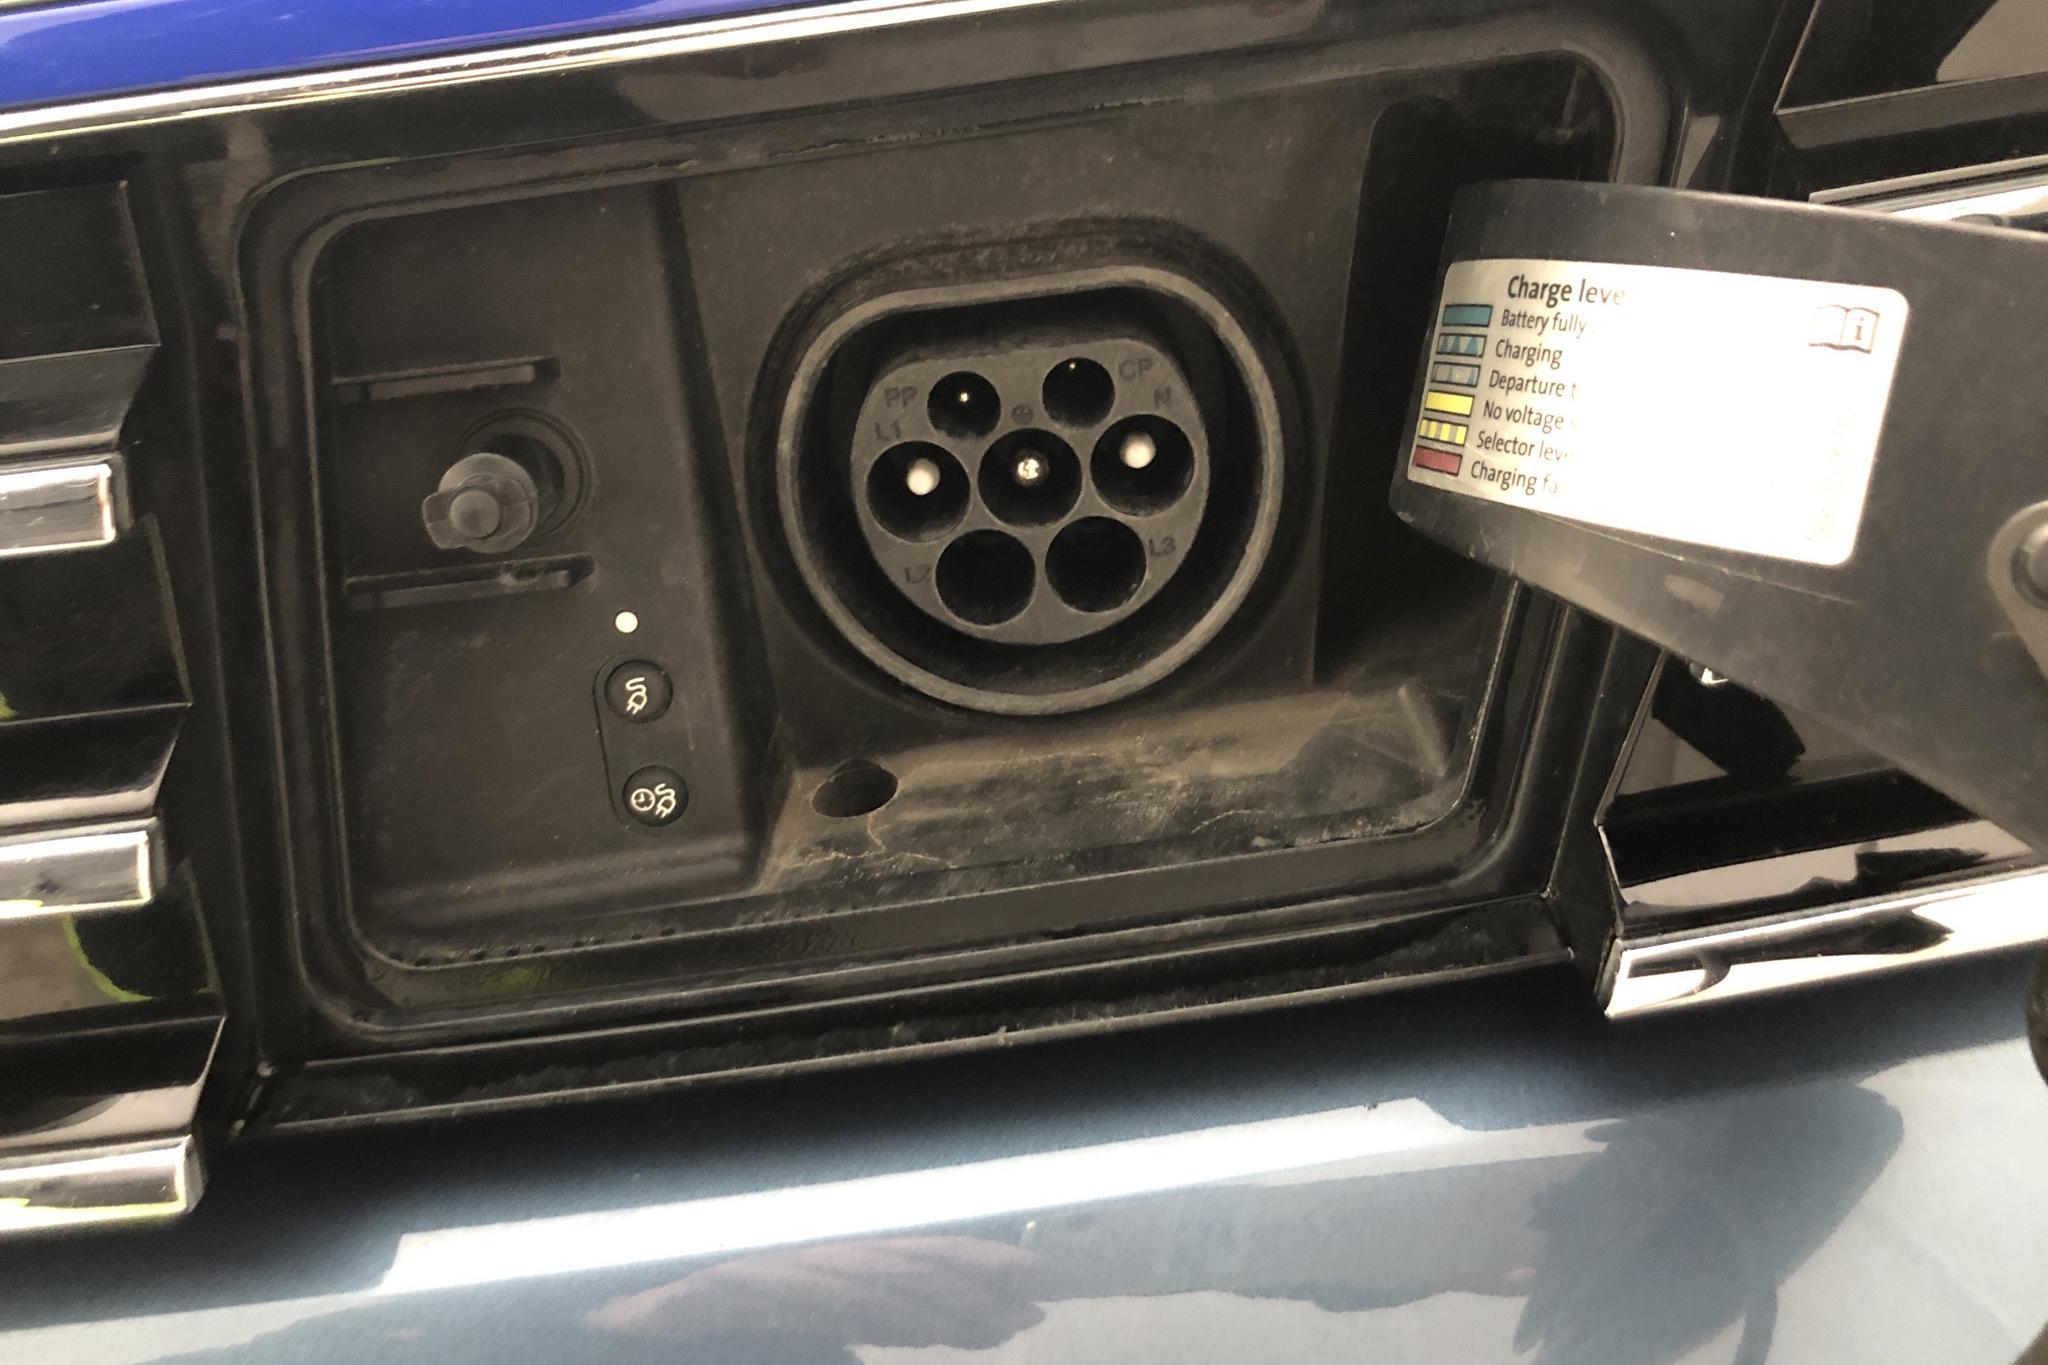 VW Passat 1.4 Plug-in-Hybrid Sportscombi (218hk) - 6 283 mil - Automat - blå - 2018